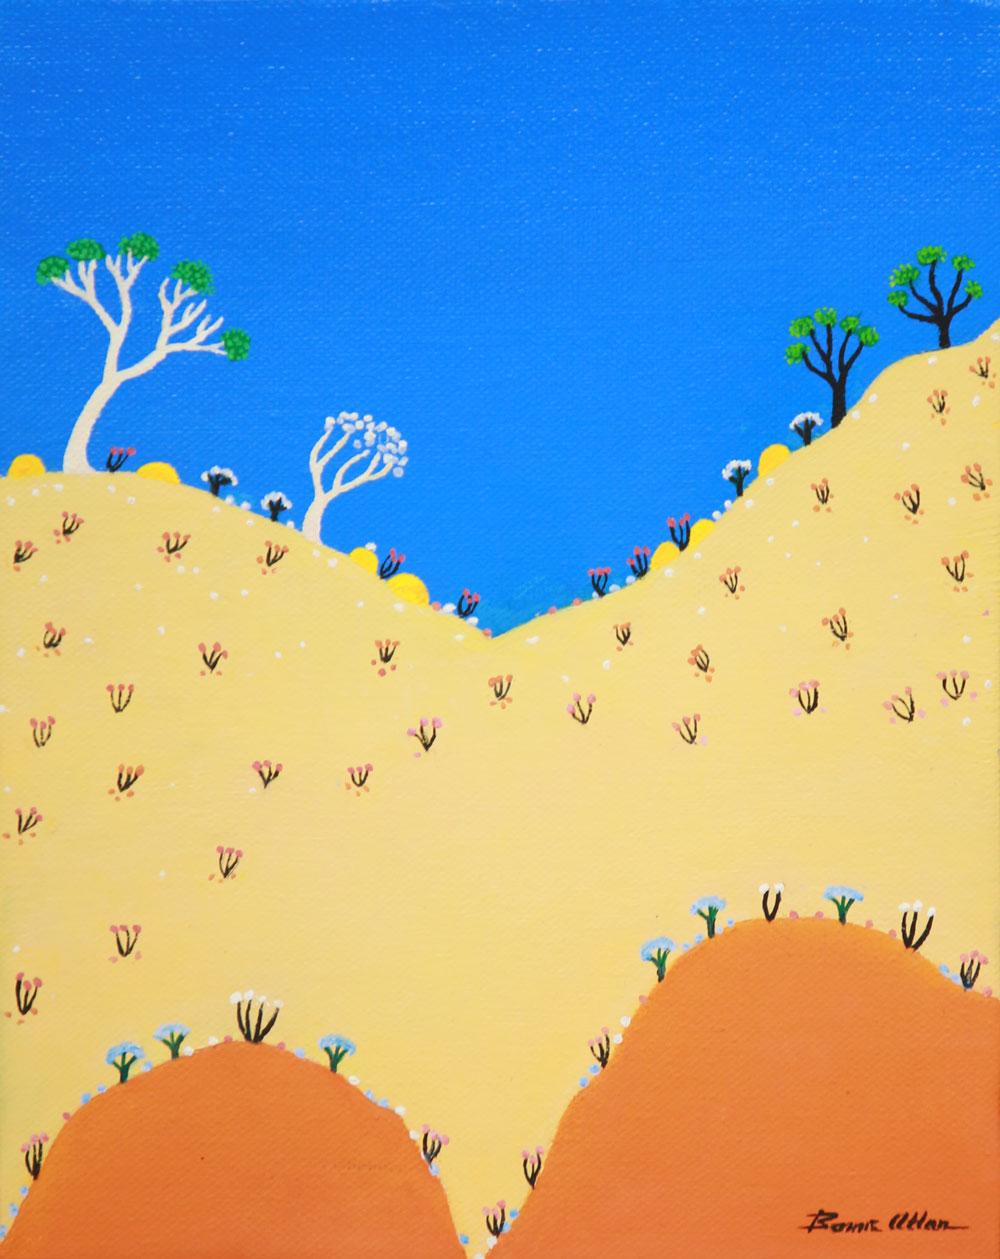 Tangerine Hill - 25 x 30 cm - $750